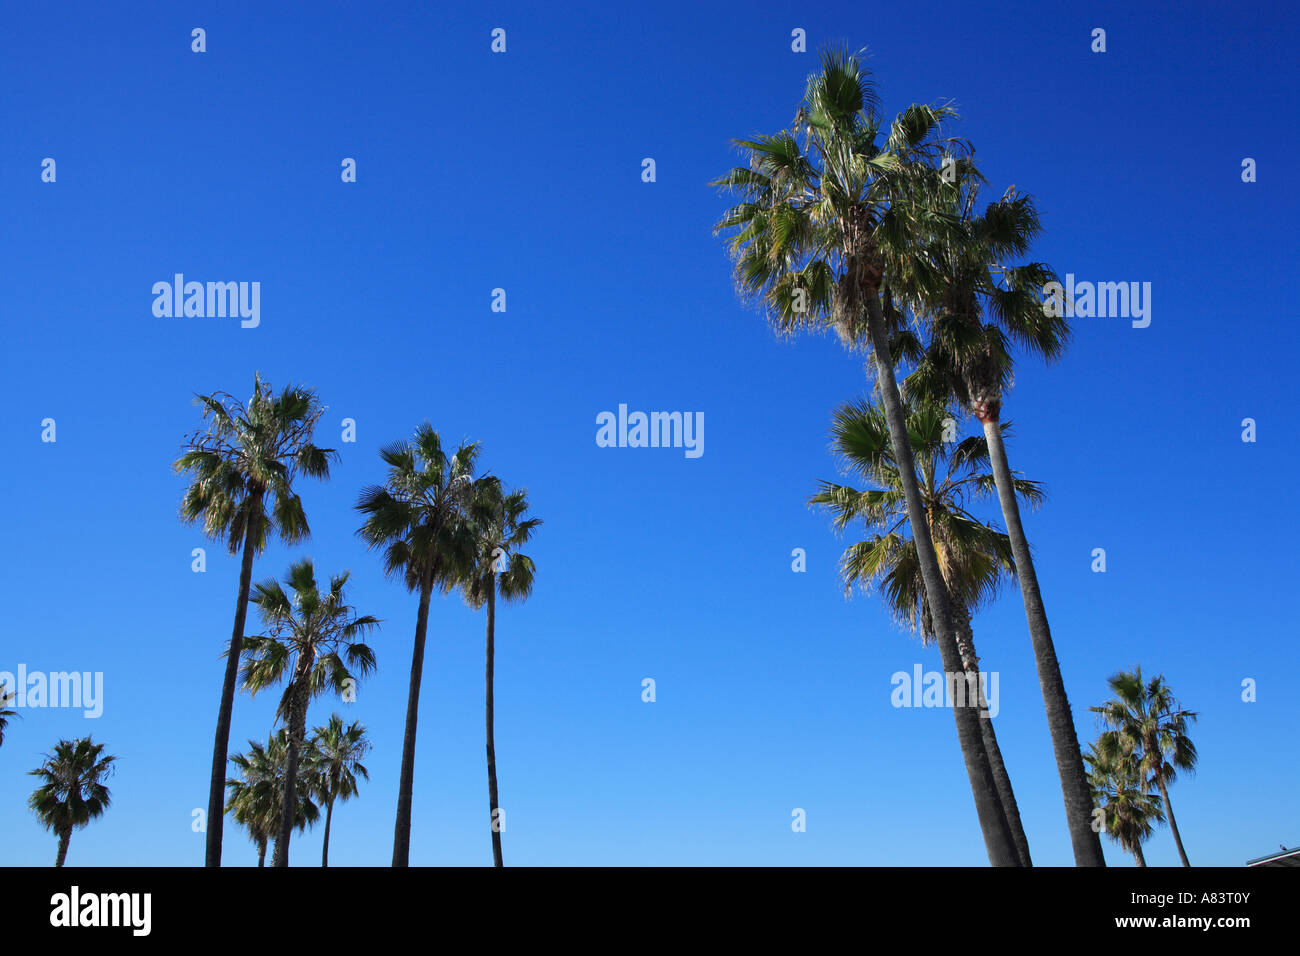 palm trees nearby boardwalk at venice beach, california, usa - Stock Image